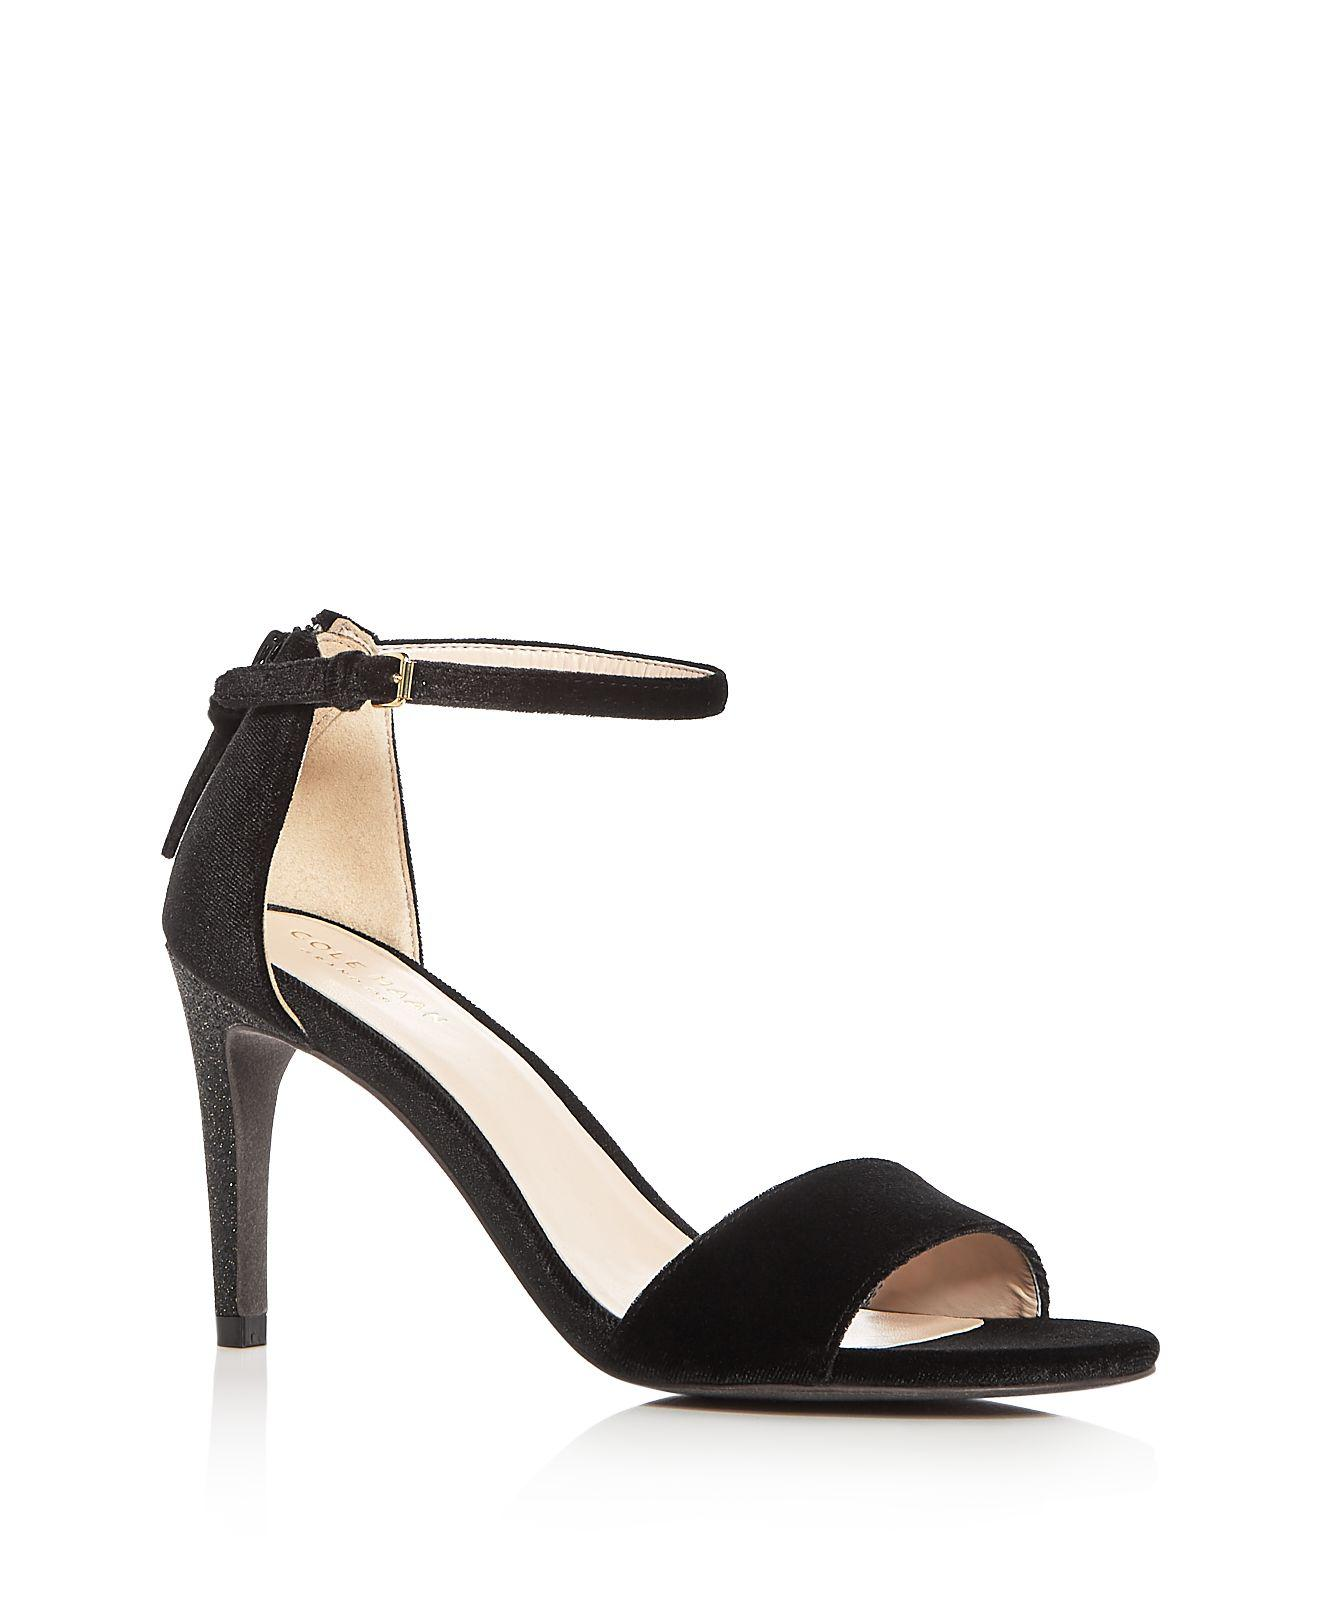 Cole Haan Women's Clara Velvet Ankle Strap Sandals L69w4ub